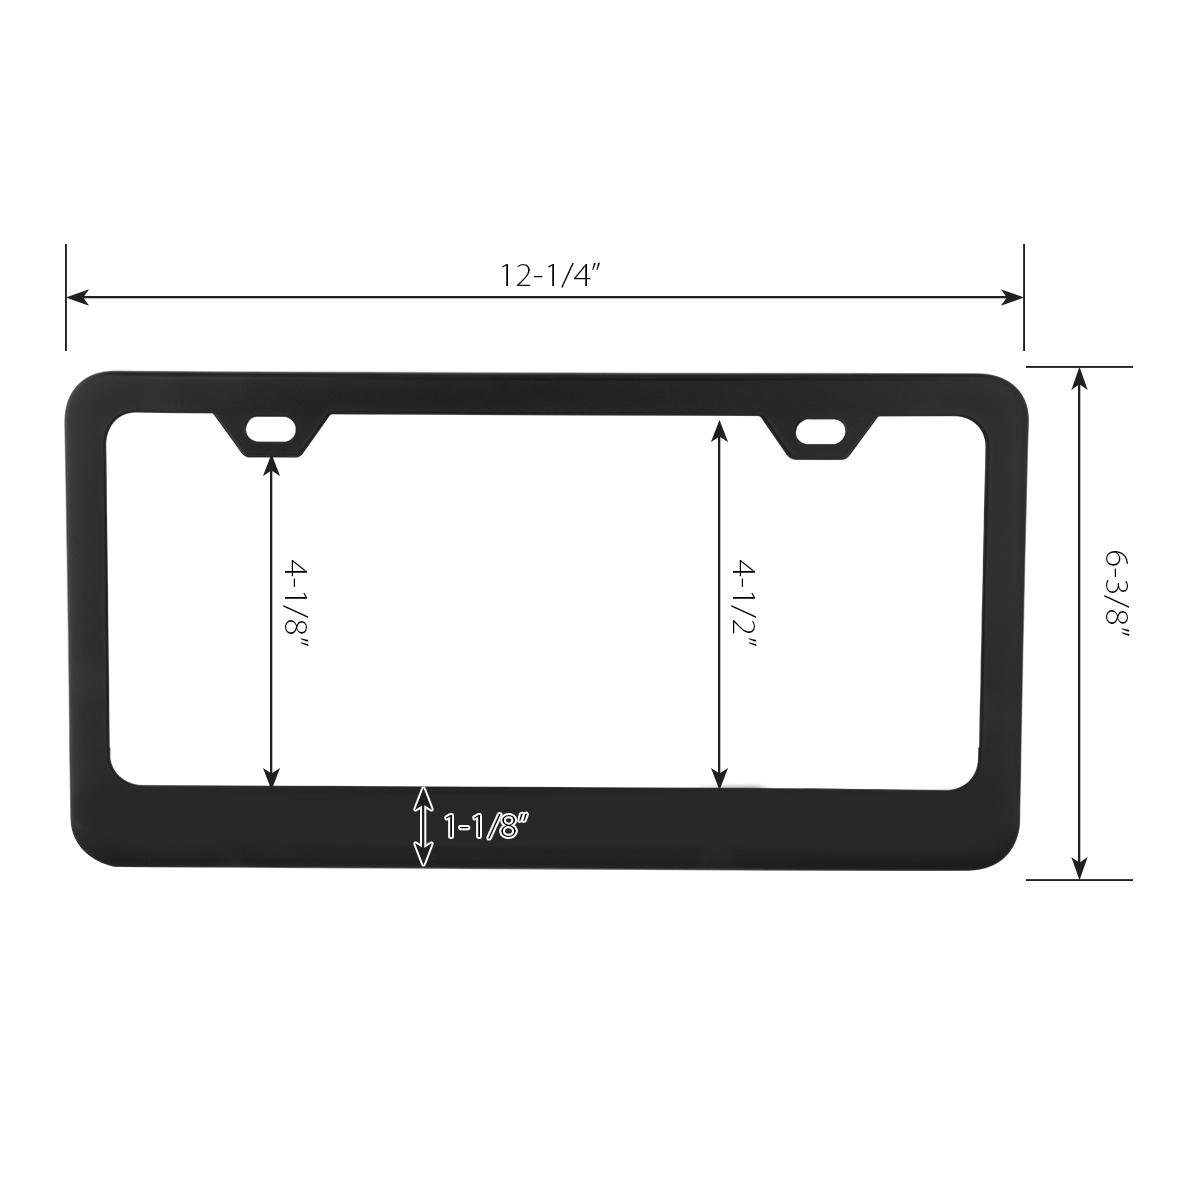 60439 Flat/Matte Plain Black 2 Hole License Plate Frame - Measurements